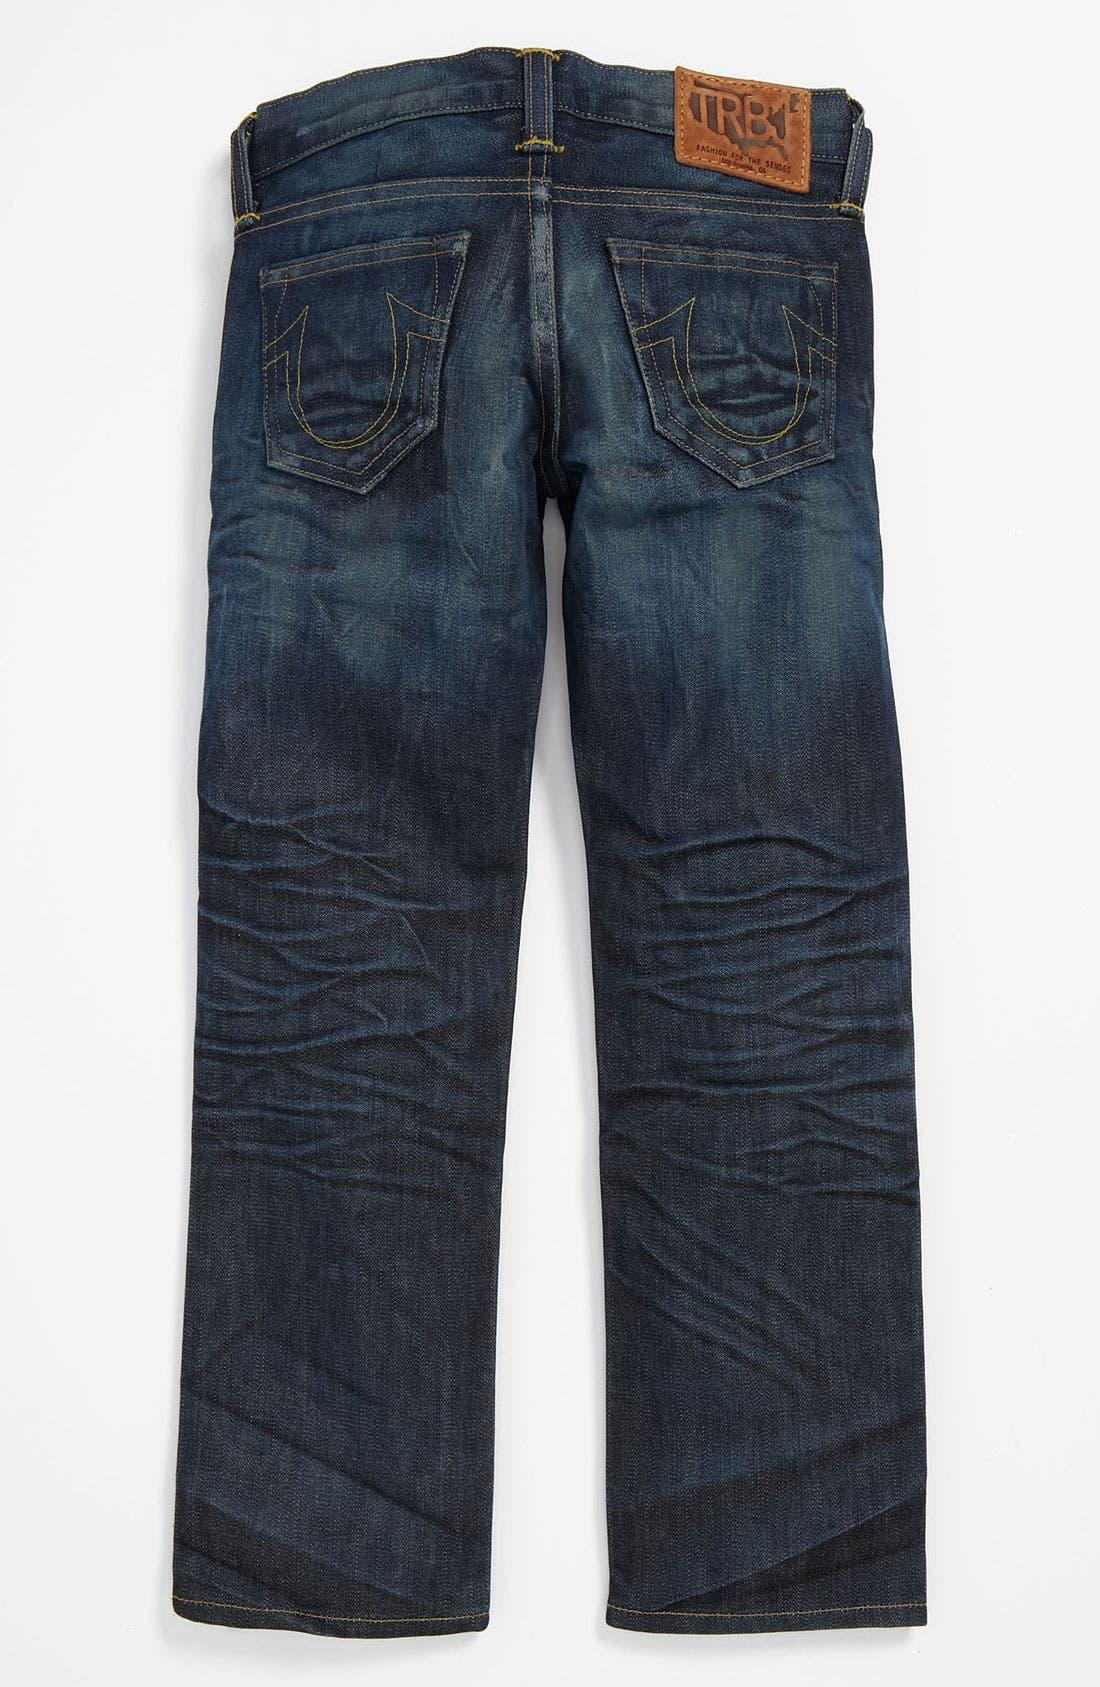 Alternate Image 1 Selected - True Religion Brand Jeans 'Herbie Phoenix' Jeans (Big Boys)